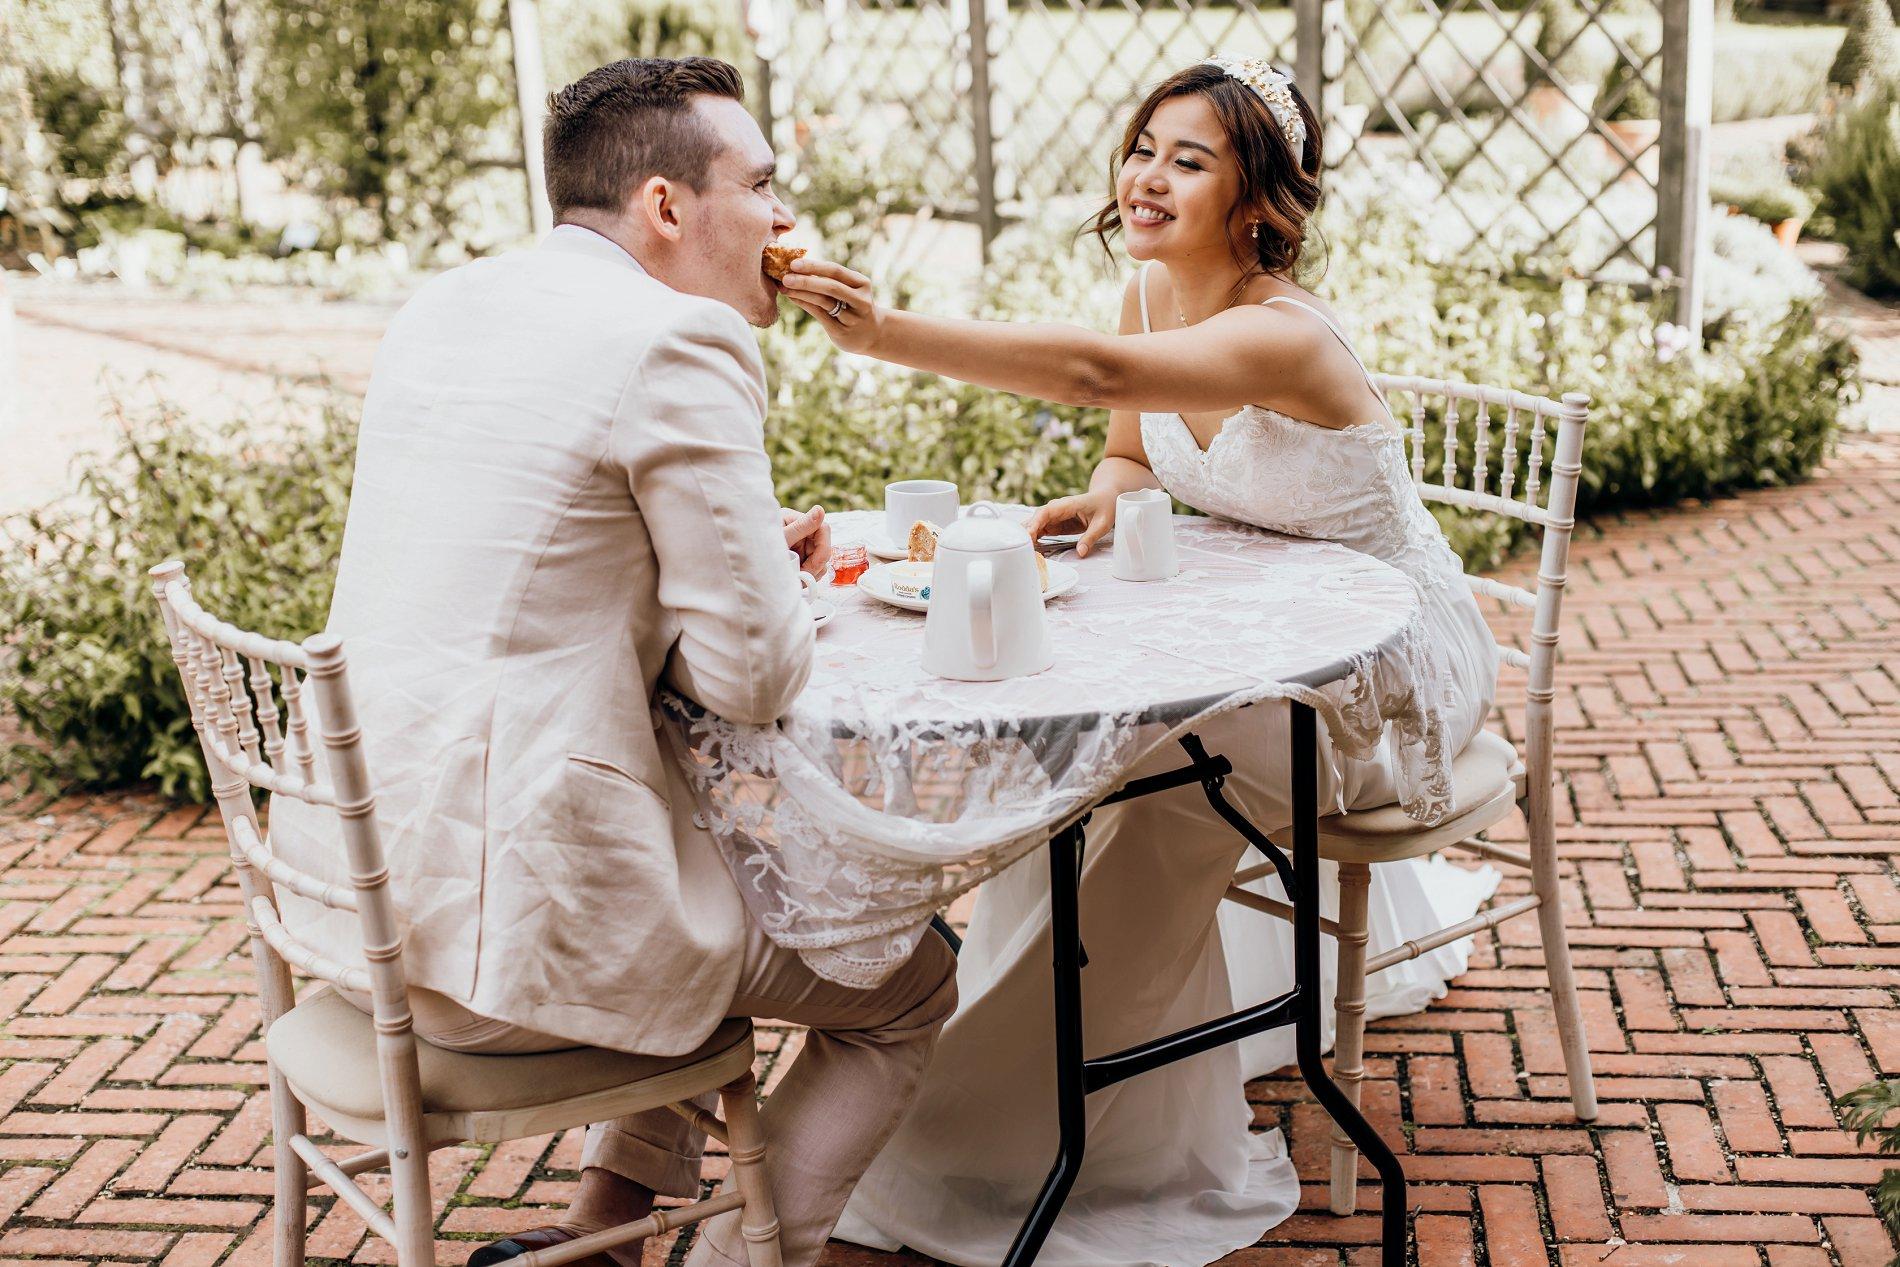 A Golden Boho Wedding Shoot at Cressing Temple Barns (c) Kate Boston Photography (34)